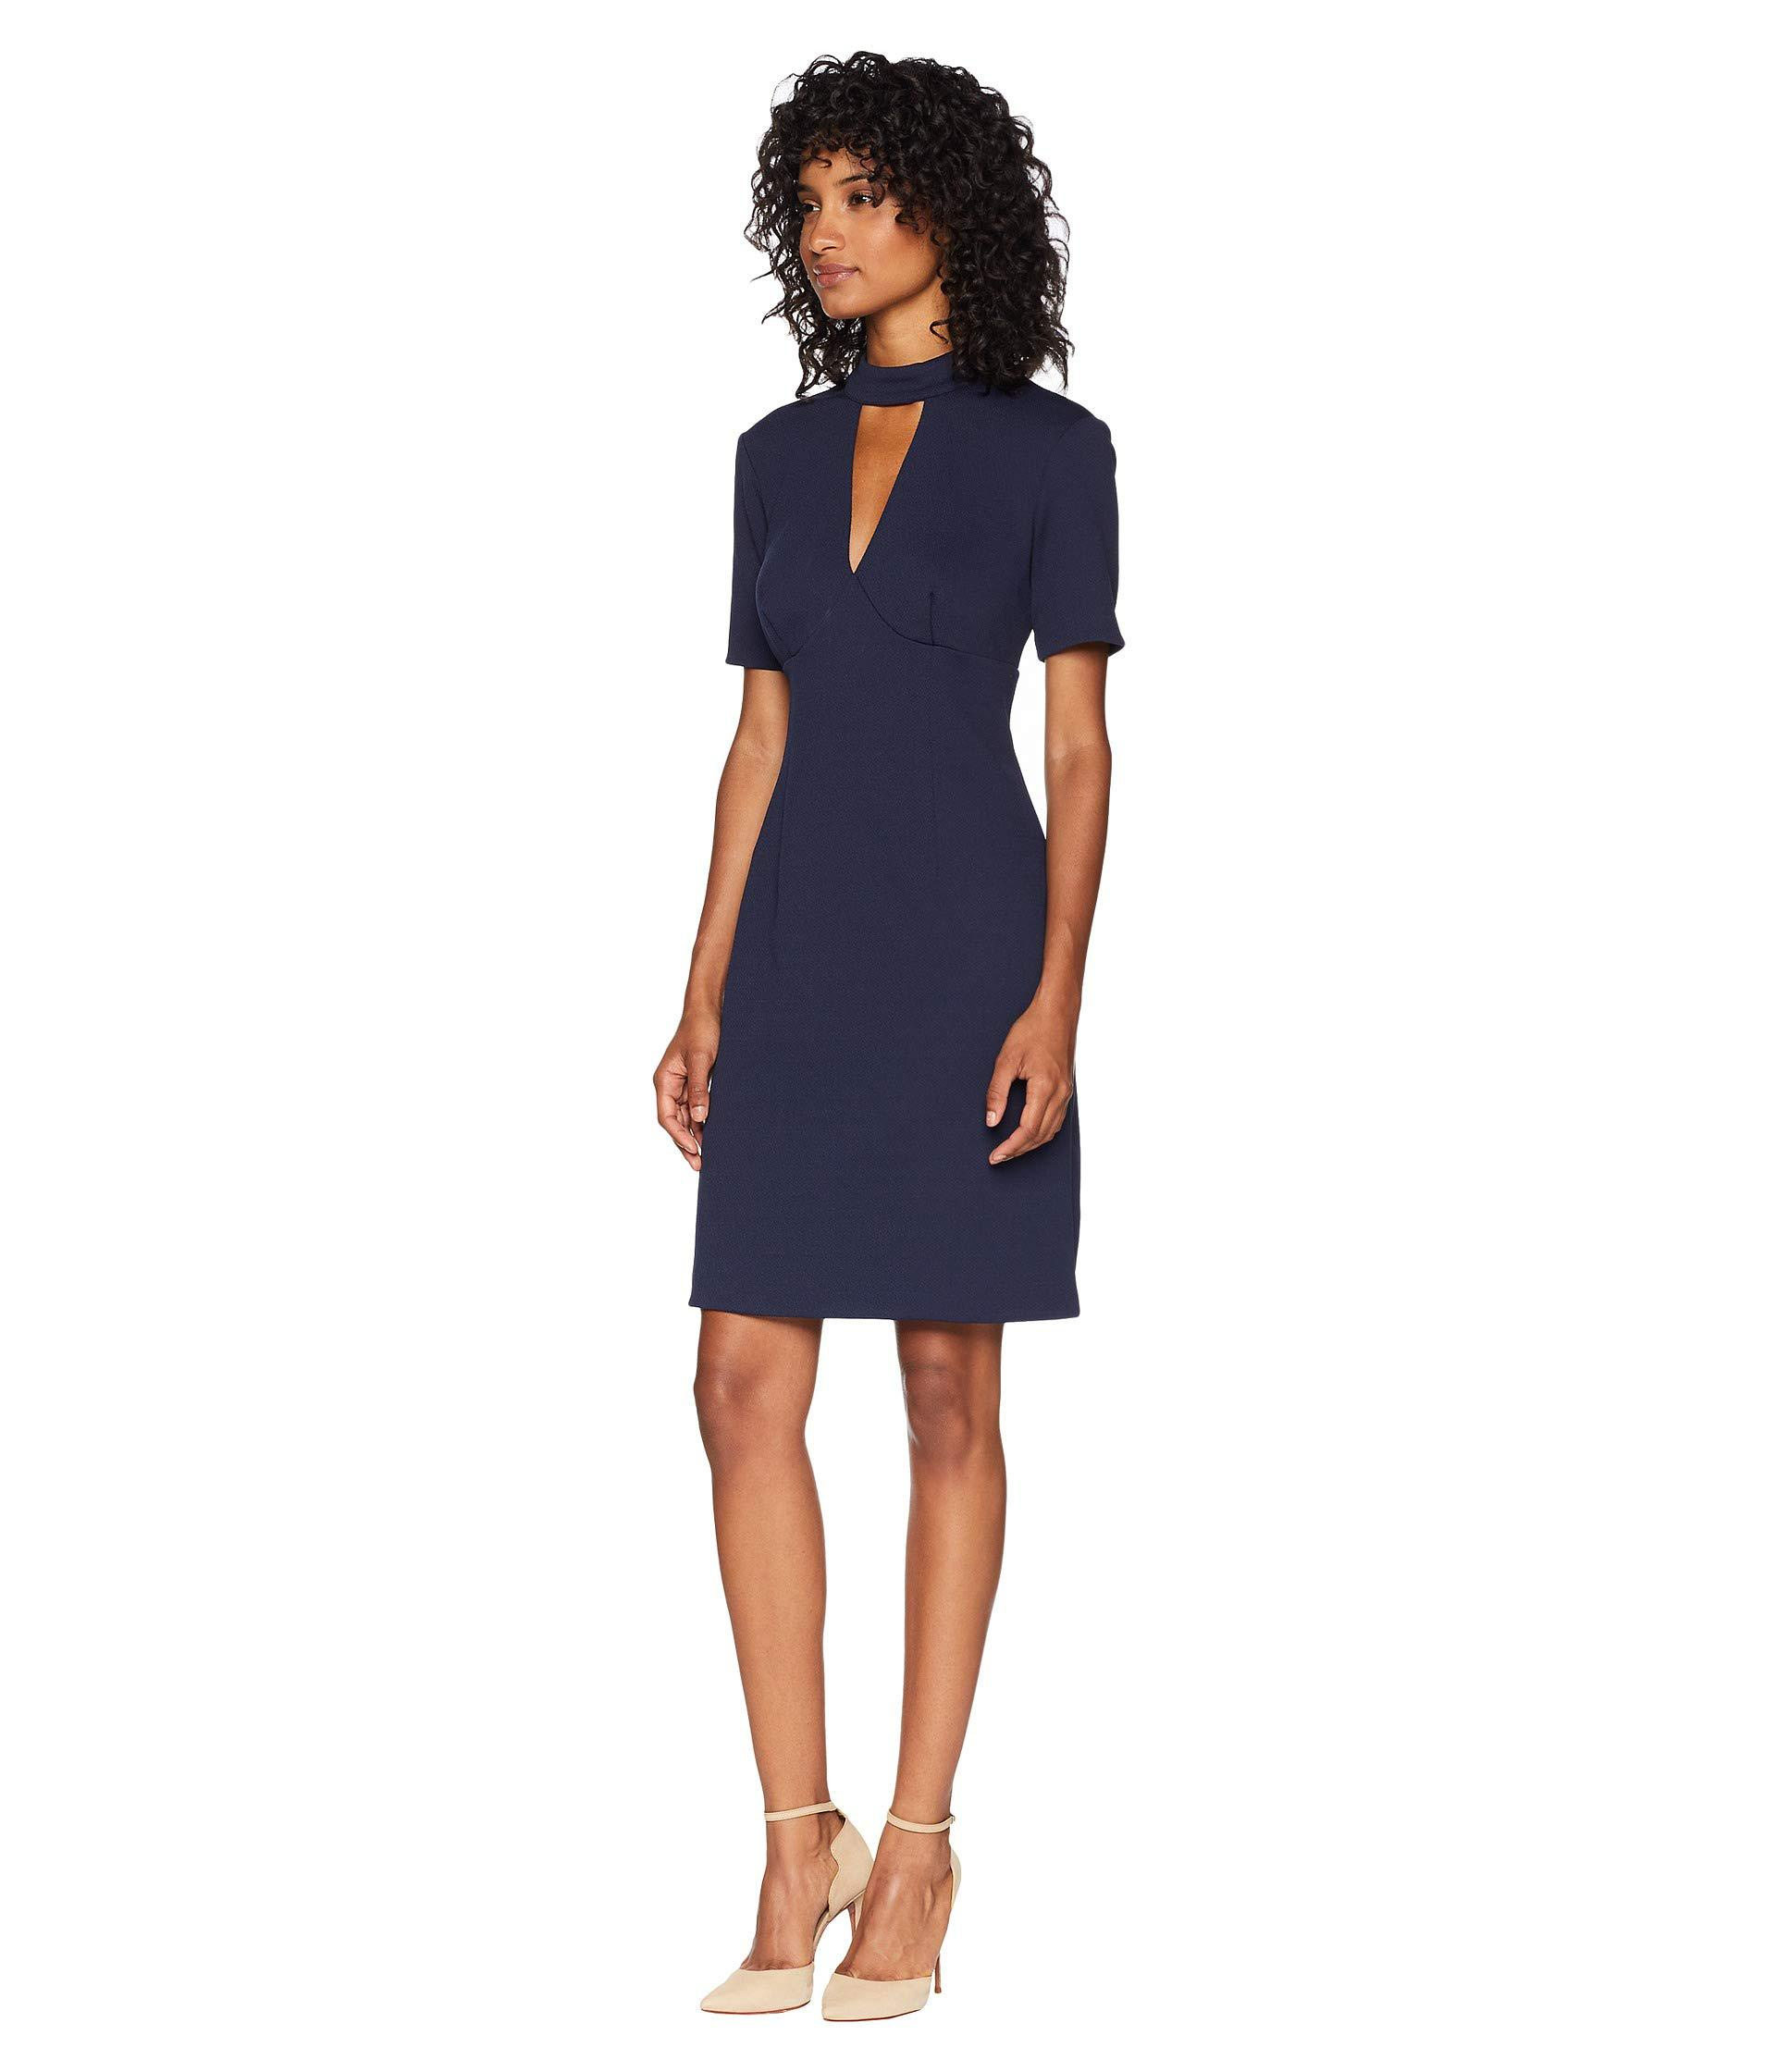 1f85abdd2403 Lyst - Trina Turk Camari Dress (indigo) Women's Dress in Blue